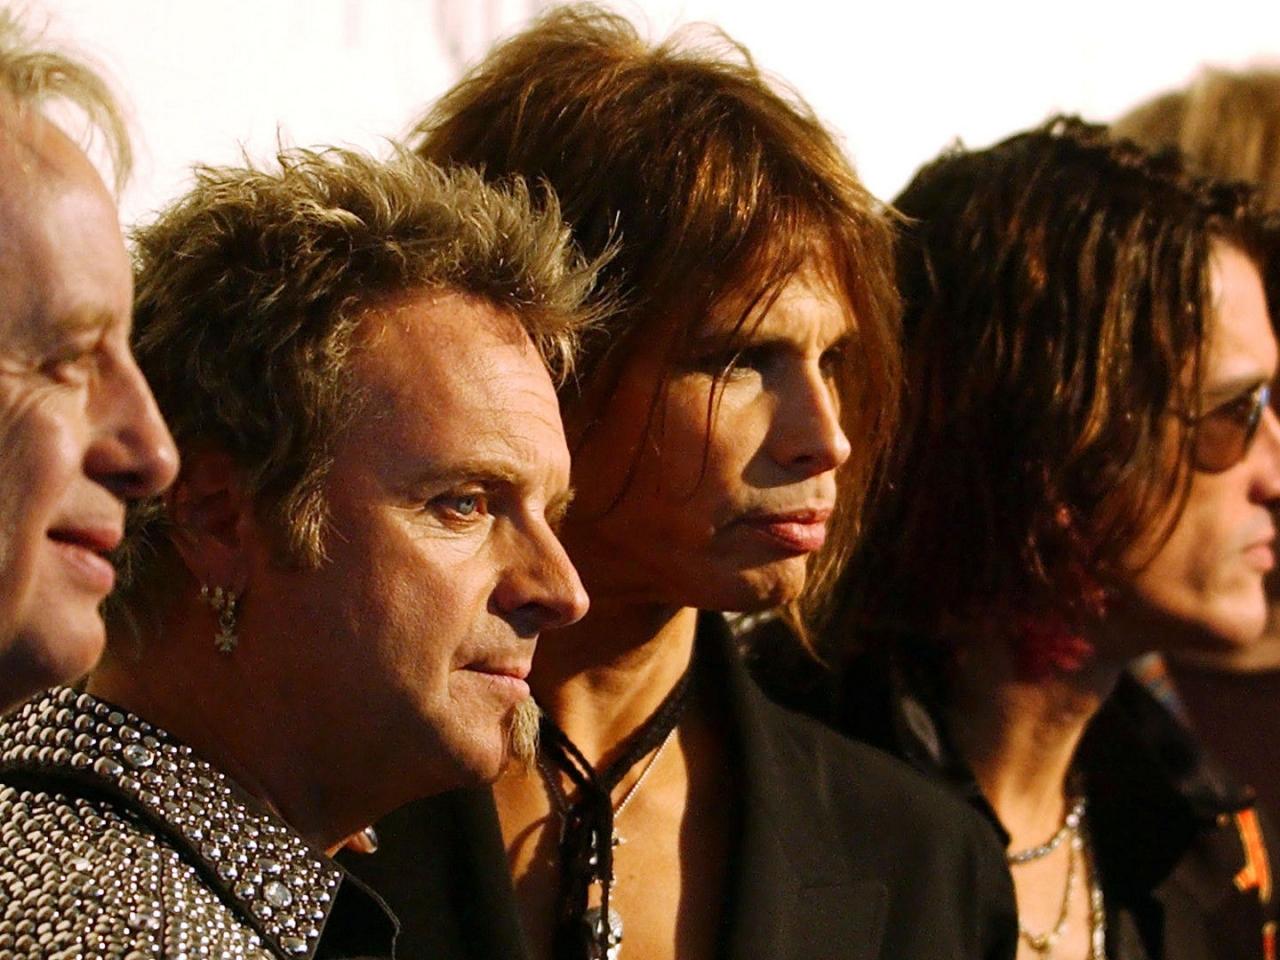 Aerosmith - 1280x960